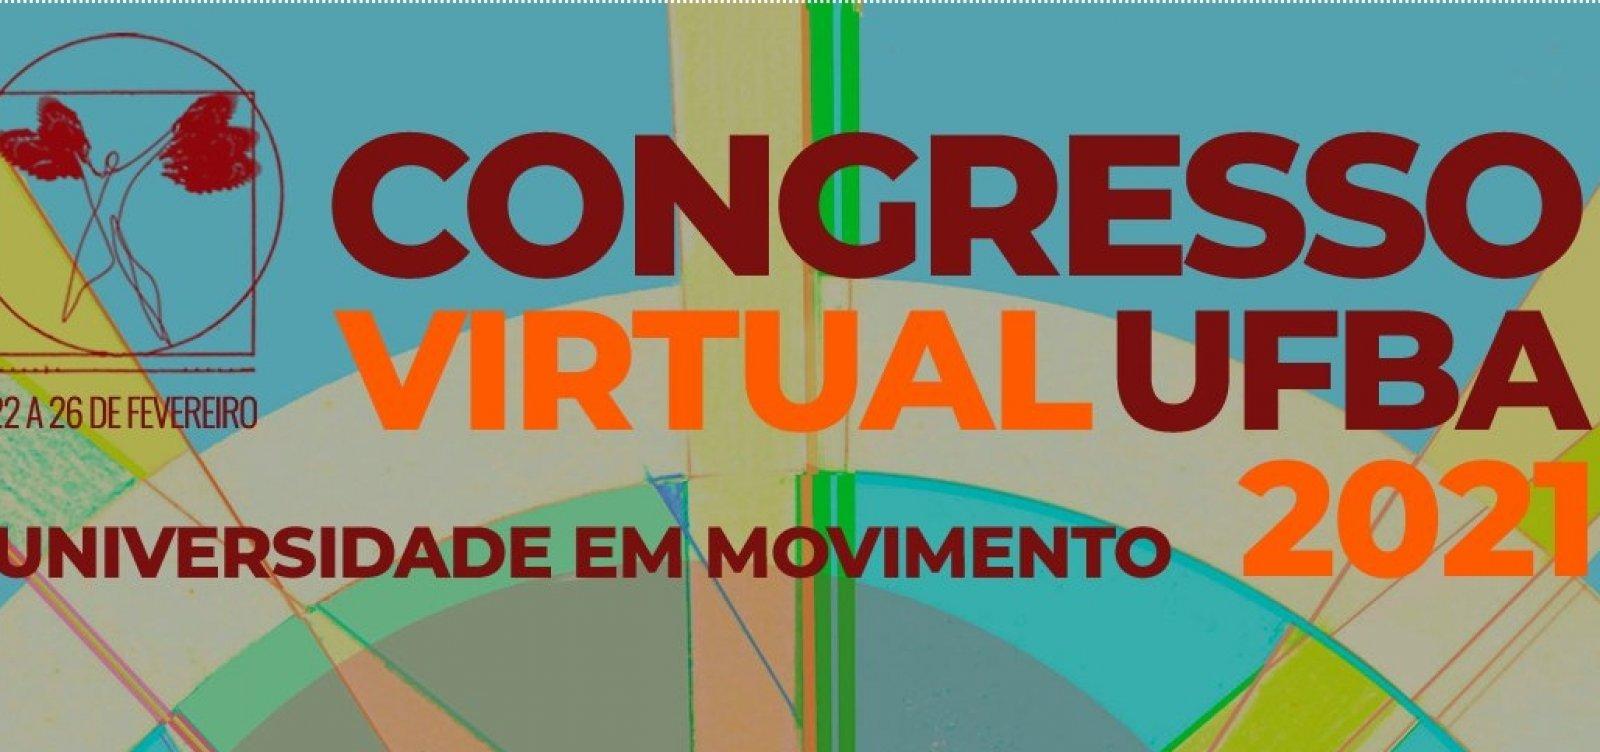 [Congresso virtual da Ufba traz debates sobre cultura, política e meio ambiente]